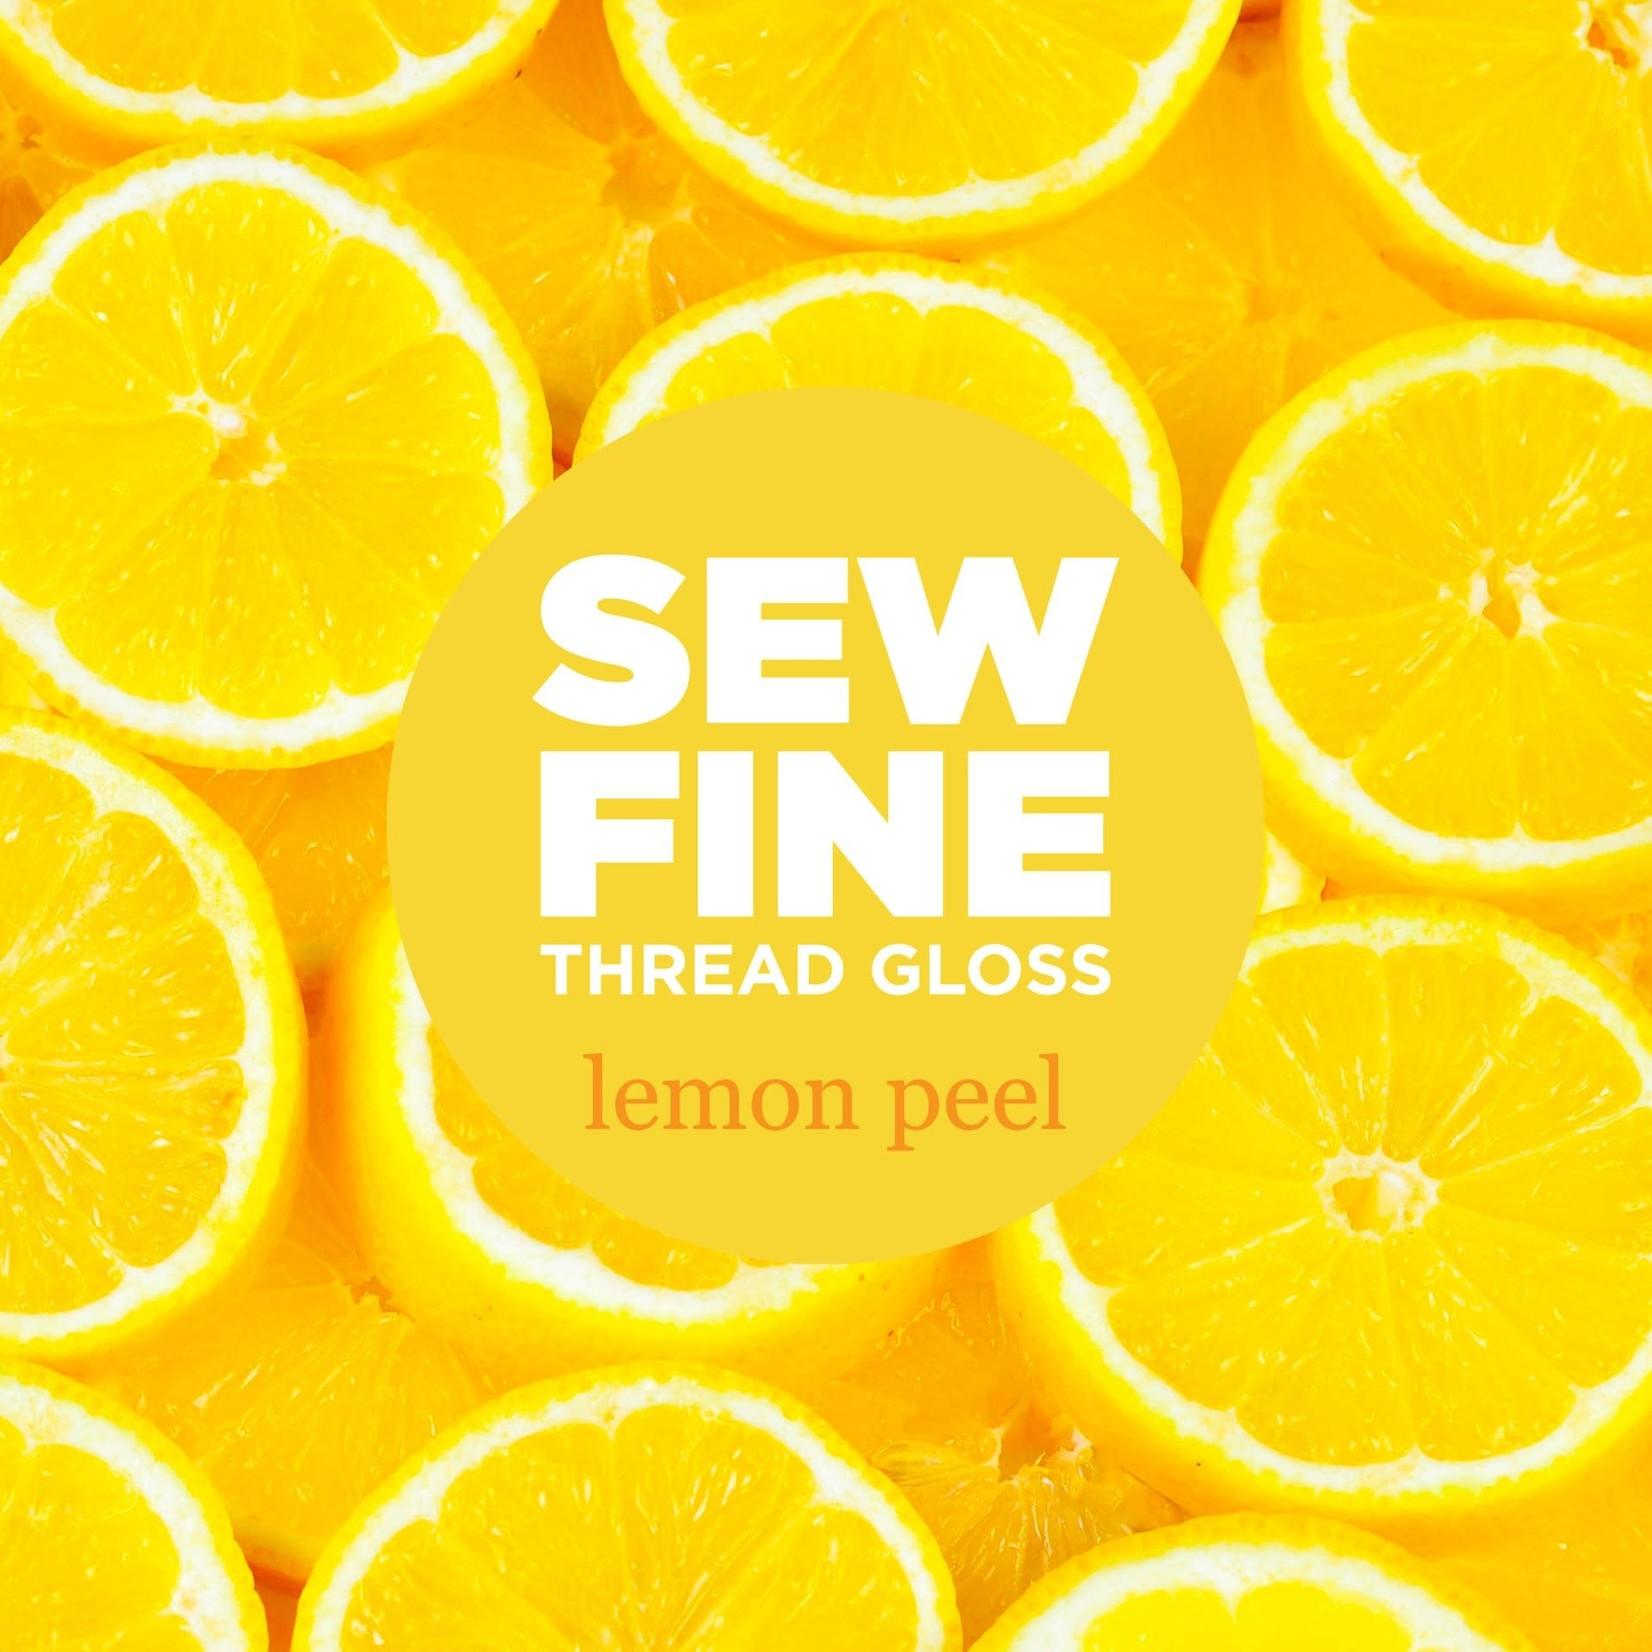 Sew Fine Sew Fine Thread Gloss: Lemon Peel 0.5 oz